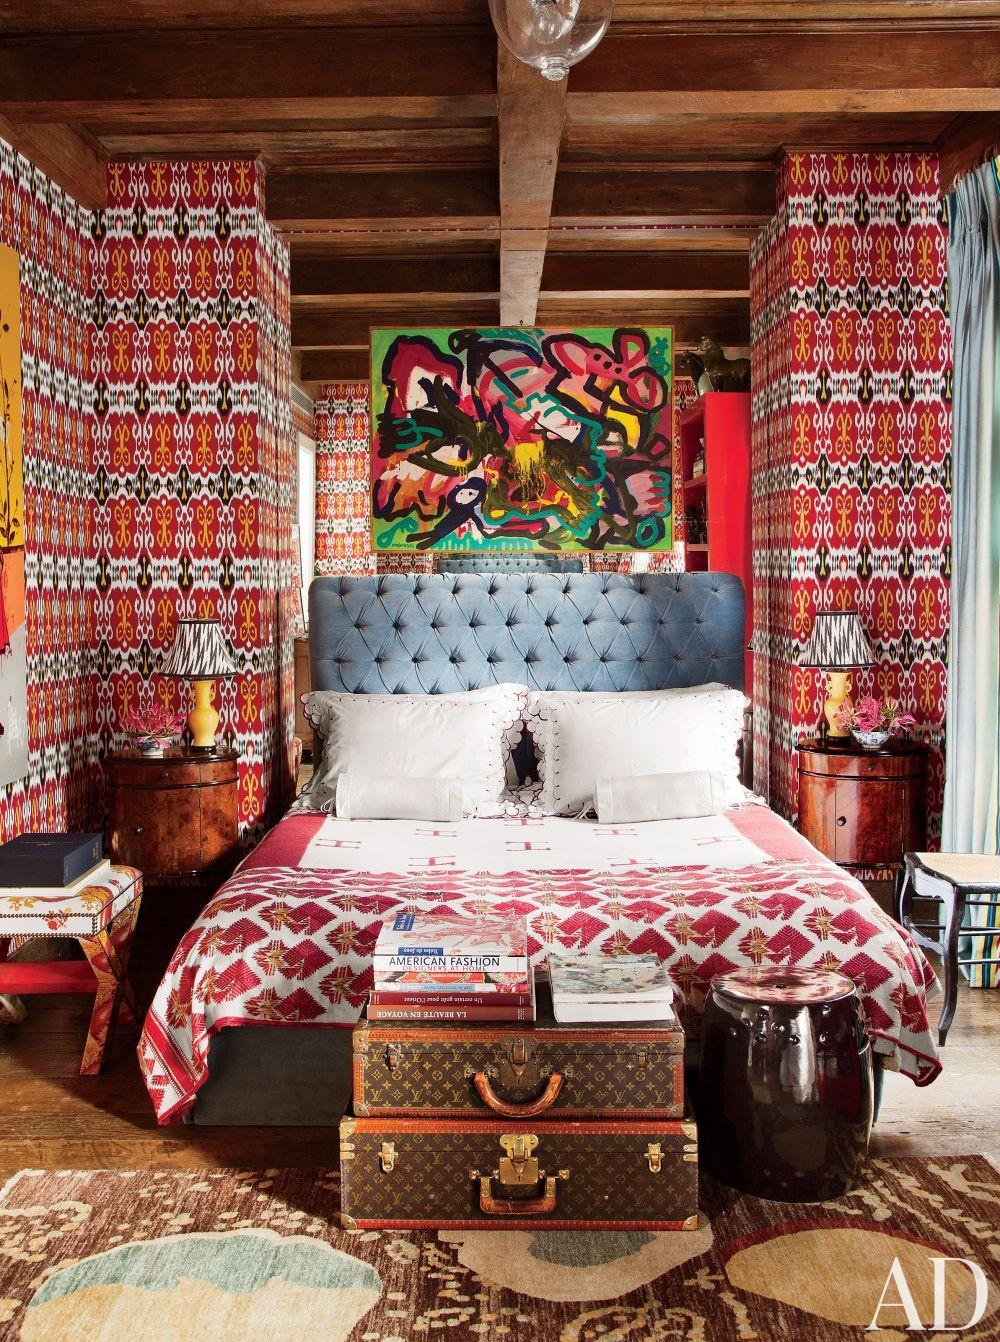 Exotic Bedroom by Sig Bergamin in São Paulo, Brazil